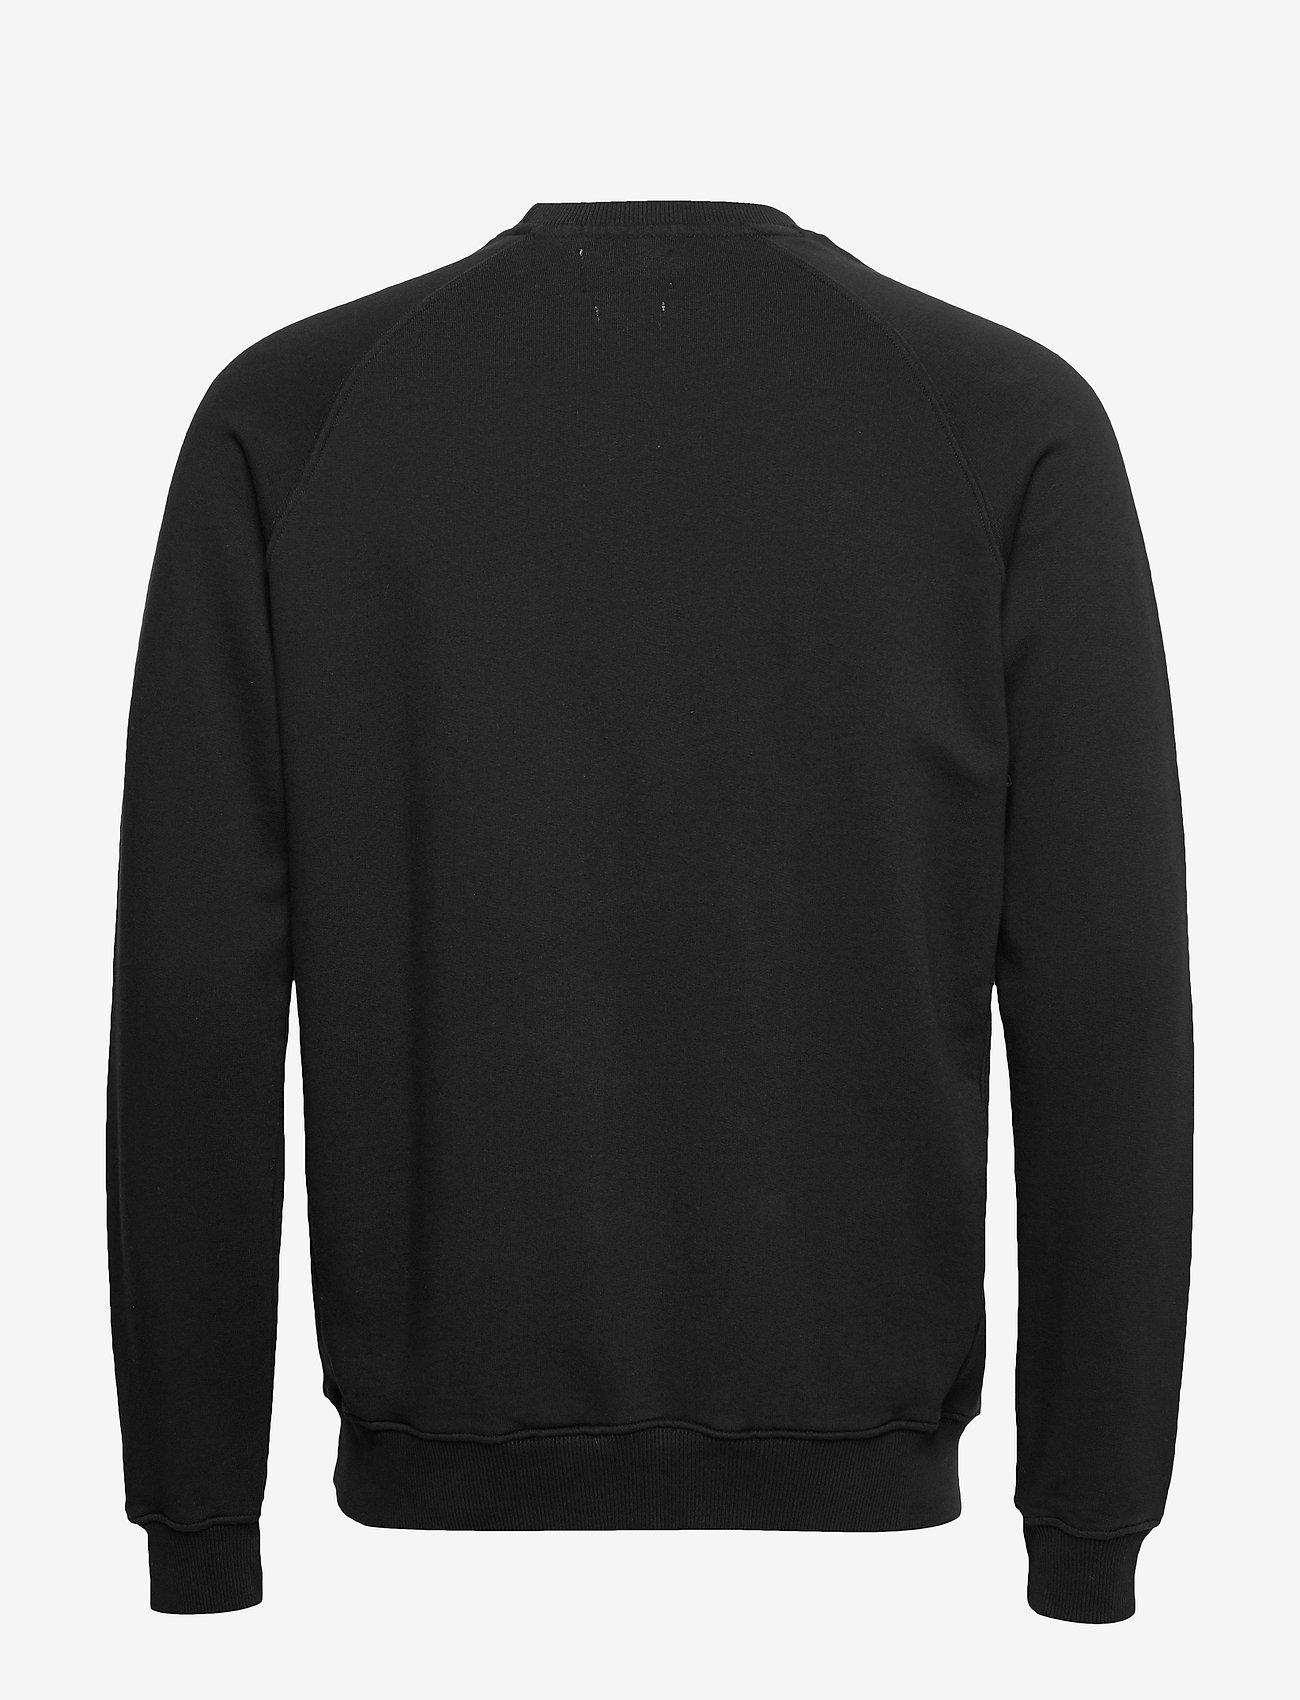 Forét - KNOT SWEATSHIRT - BLACK - basic-sweatshirts - black - 1